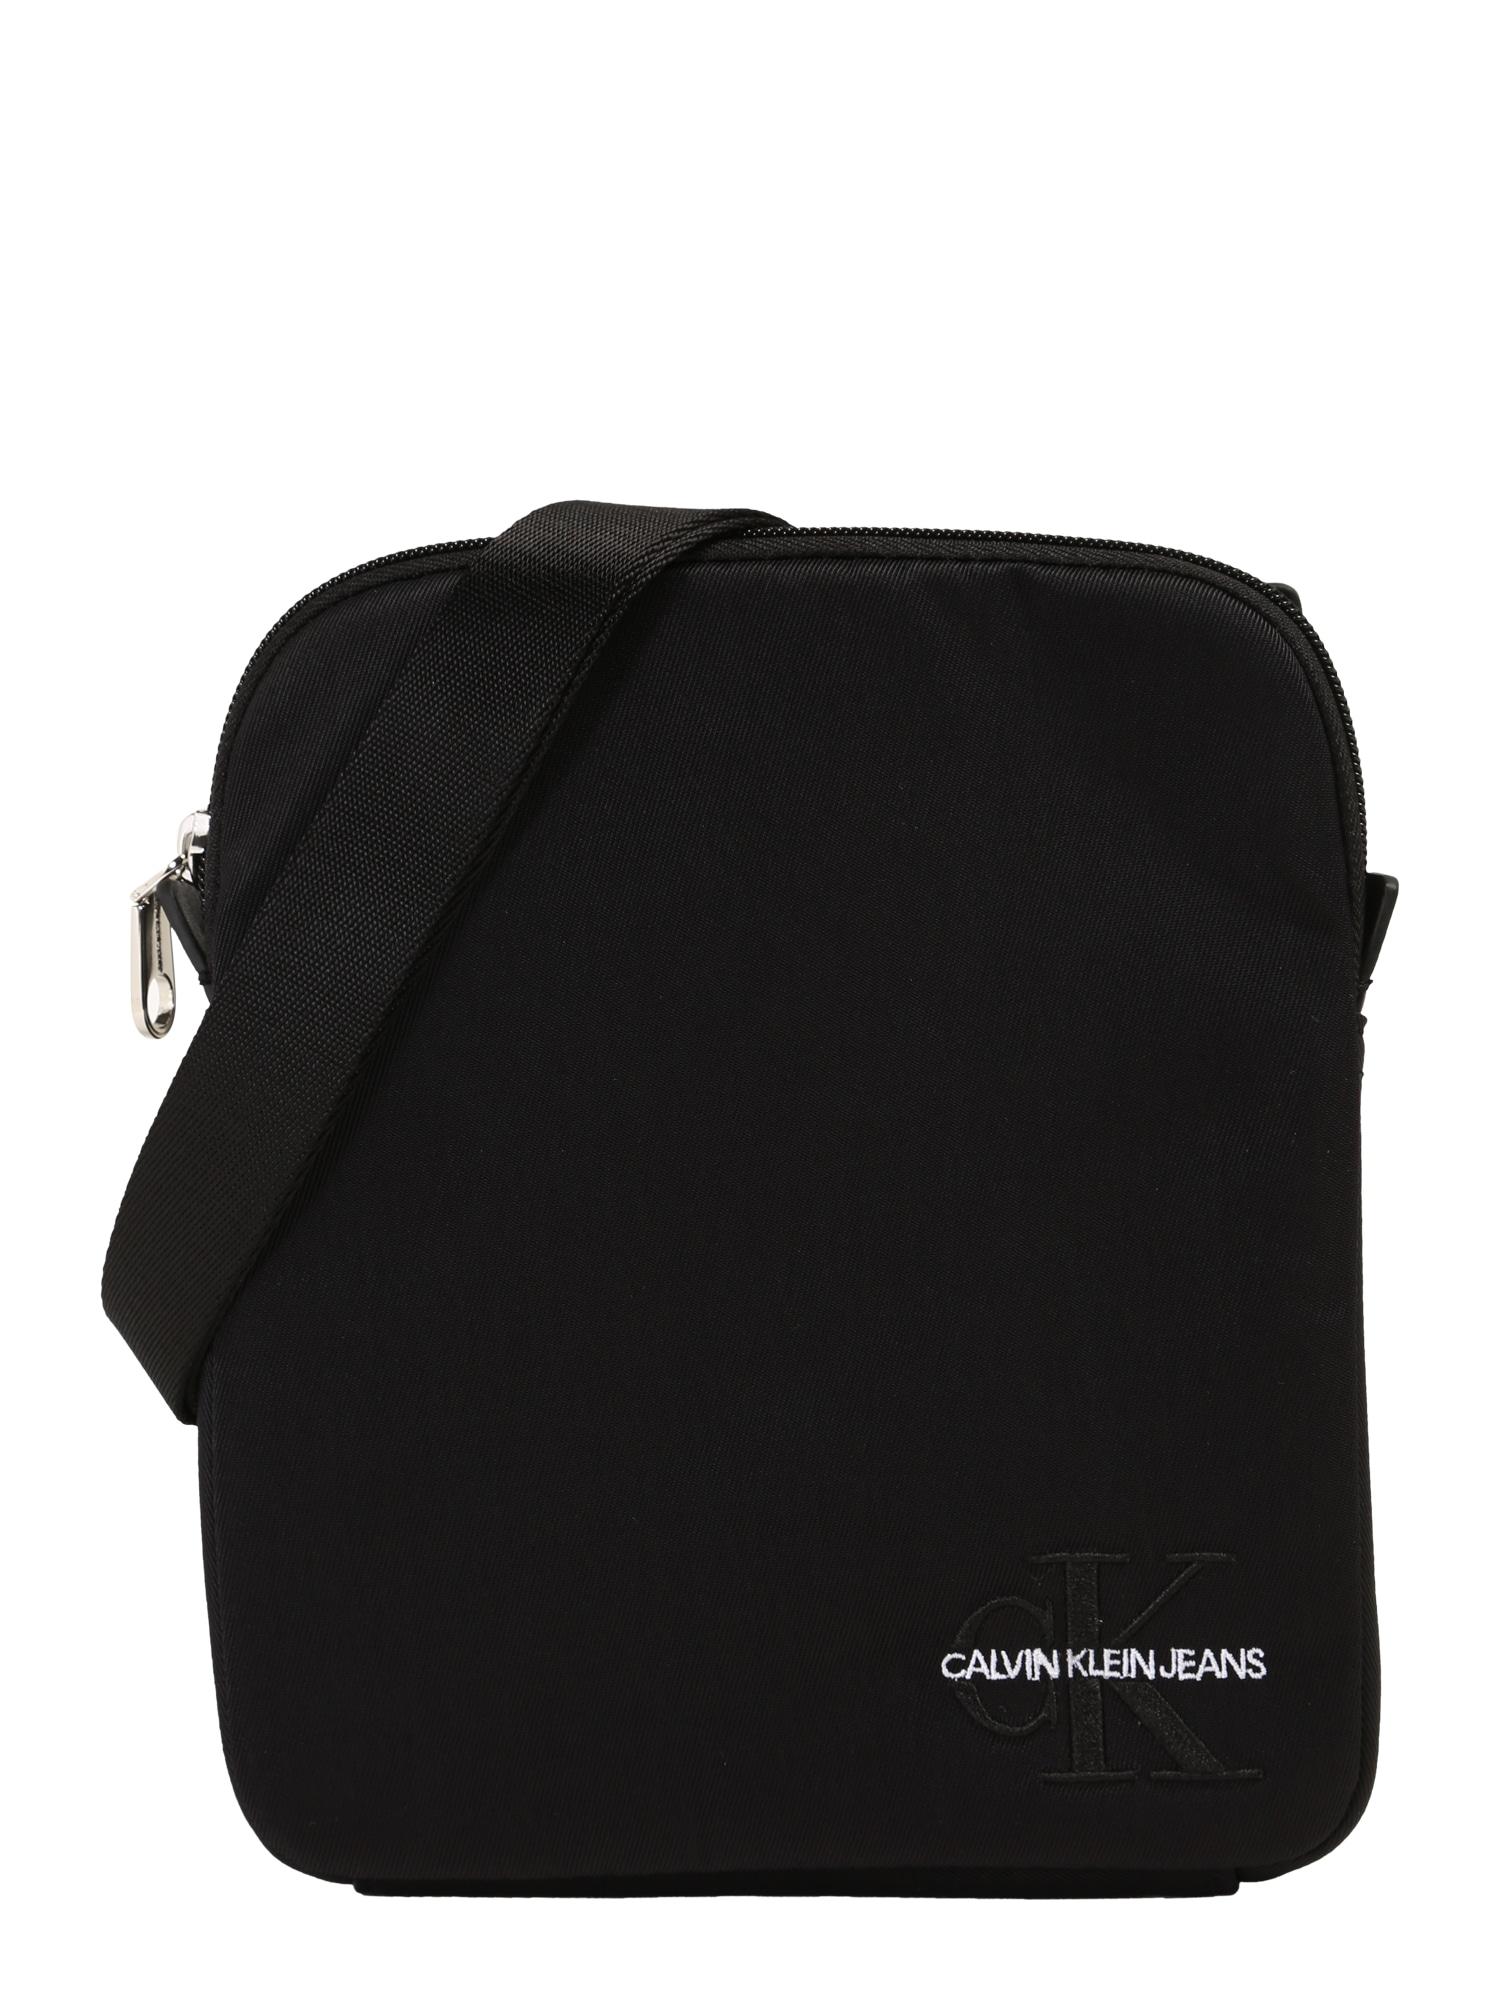 Calvin Klein Jeans Taška přes rameno 'MONOGRAM NYLON MICRO FP'  černá